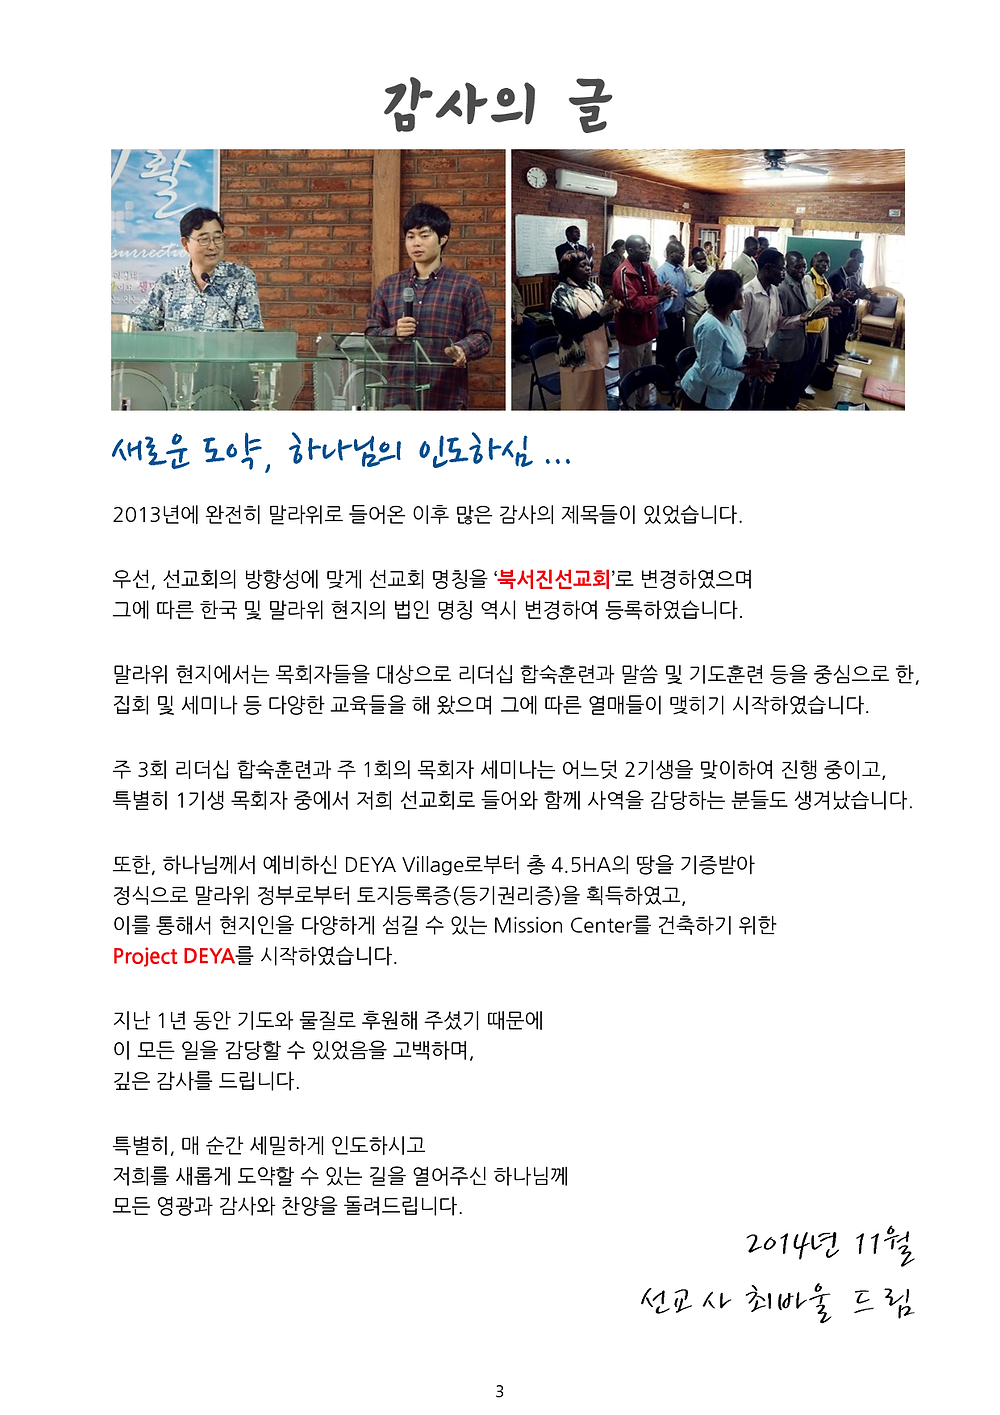 NWM 2014년 선교보고_3.png